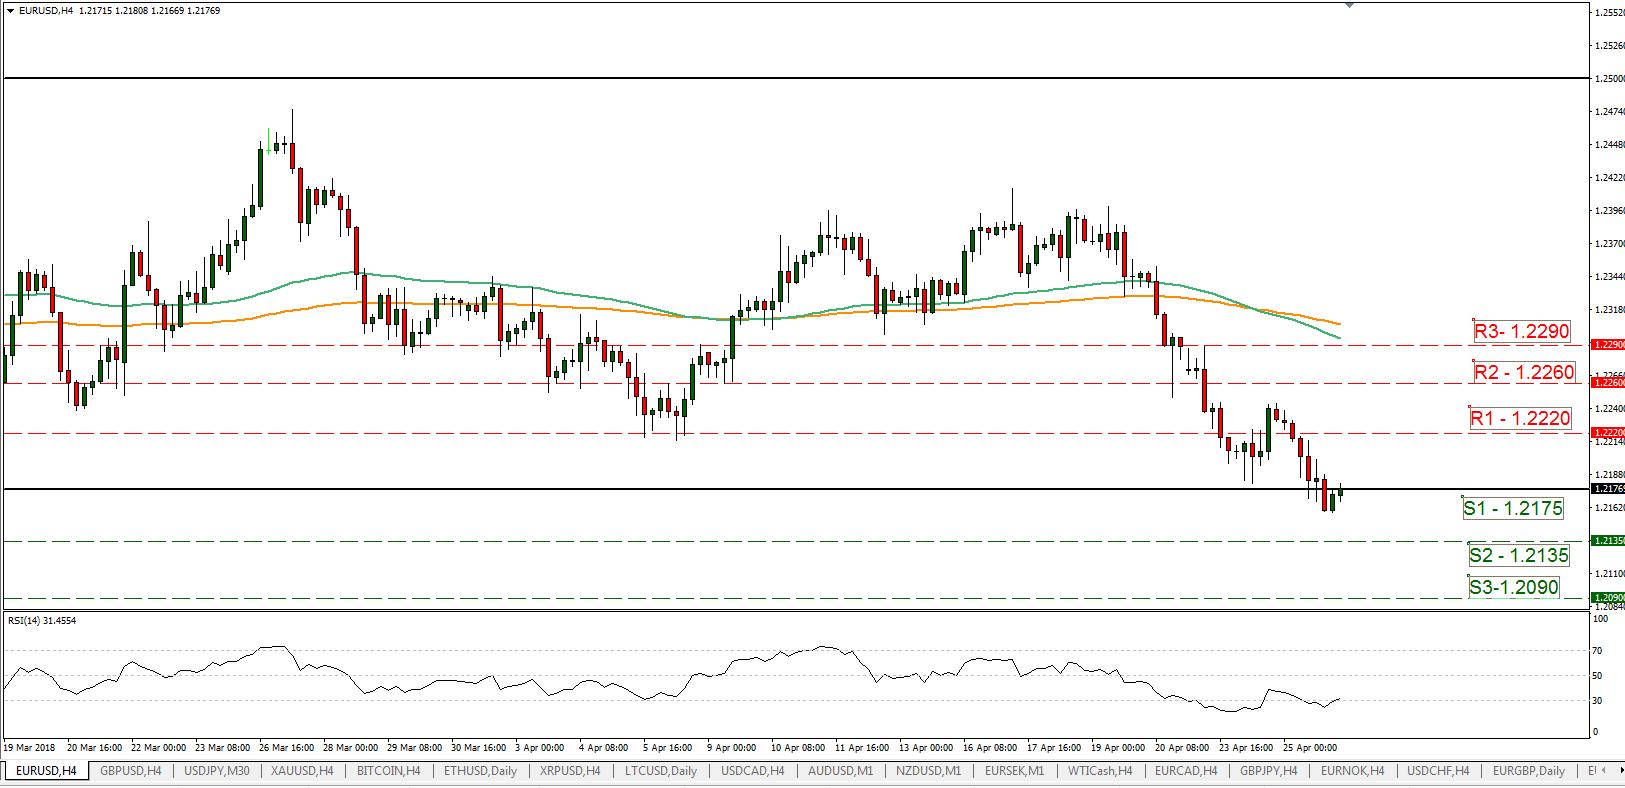 EUR/USD 26/04/2018 | EconAlerts